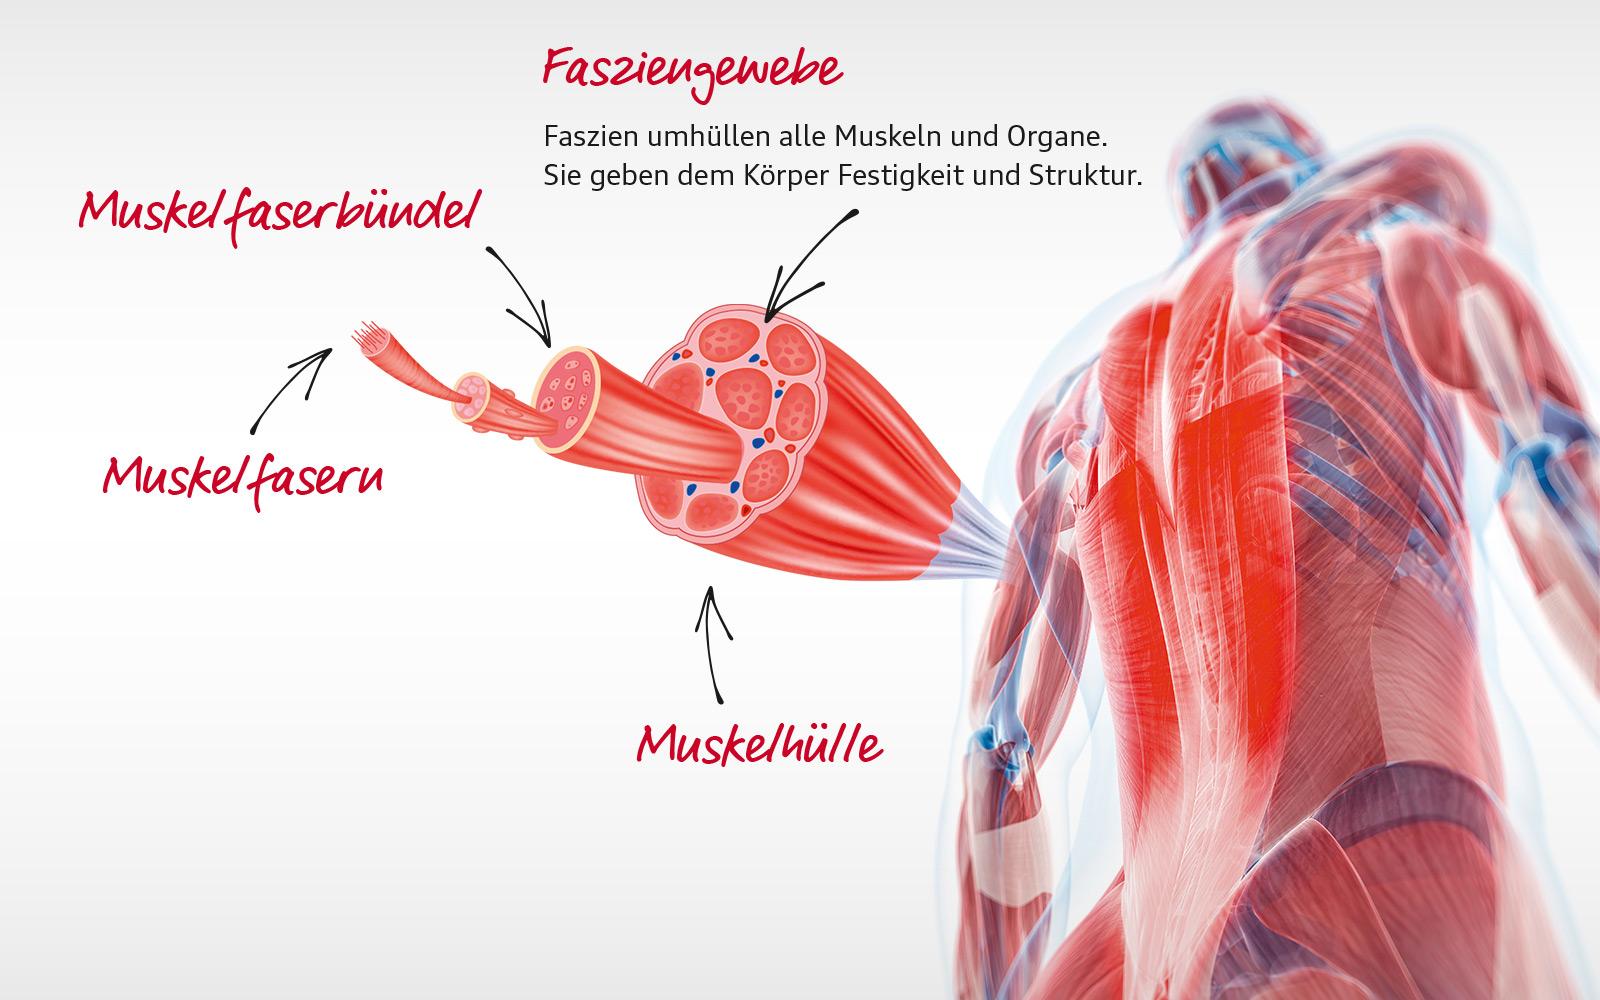 cook&fit - Audi BKK /gesundheit